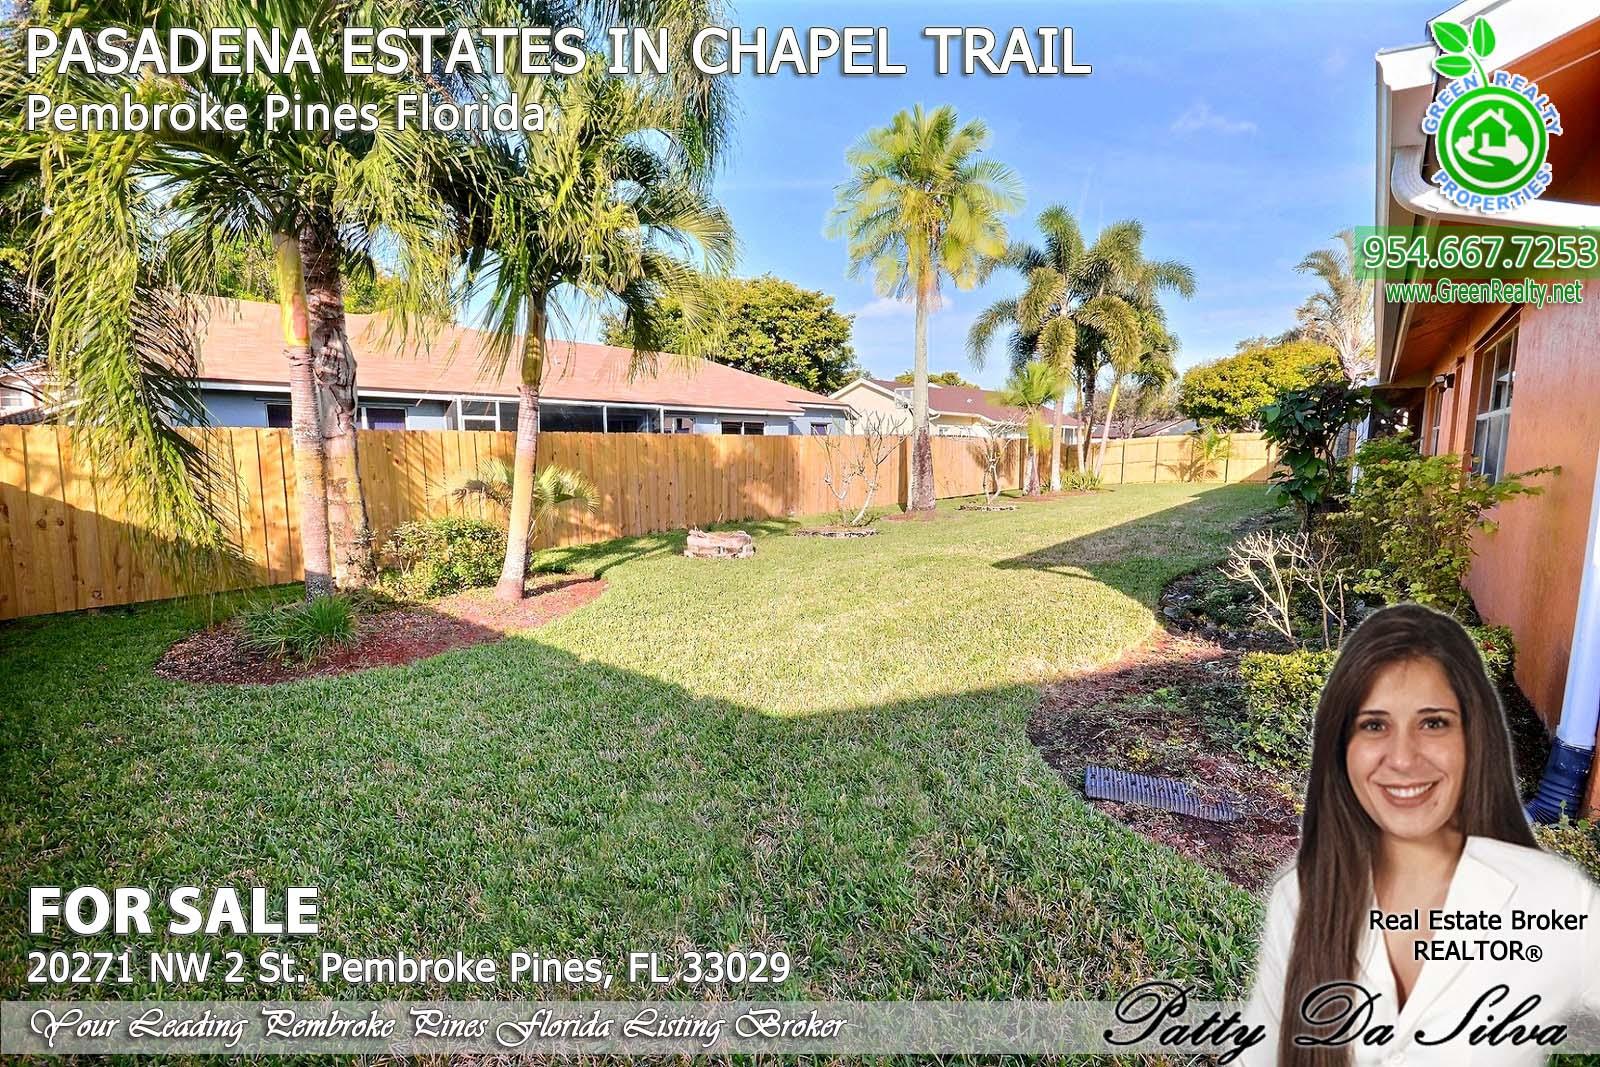 Pasadena Estates of Chapel Trail - Pembroke Pines FL south florida